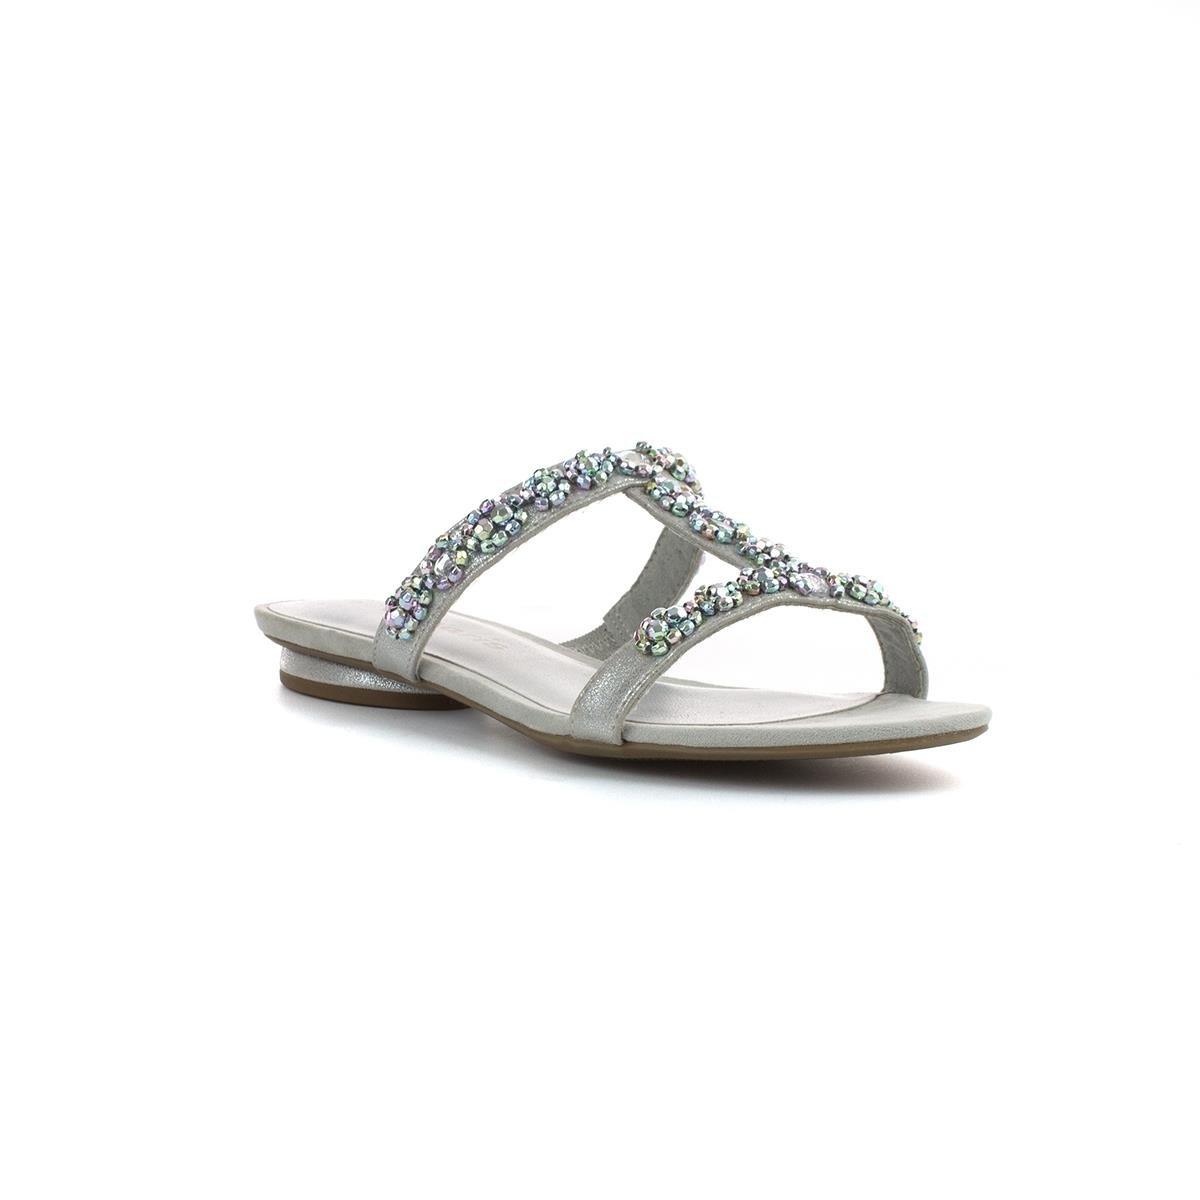 dbea3308c3a2 Tamaris Womens Silver Slip On Flat Sandal - Size 41 - Multicolour   Amazon.co.uk  Shoes   Bags